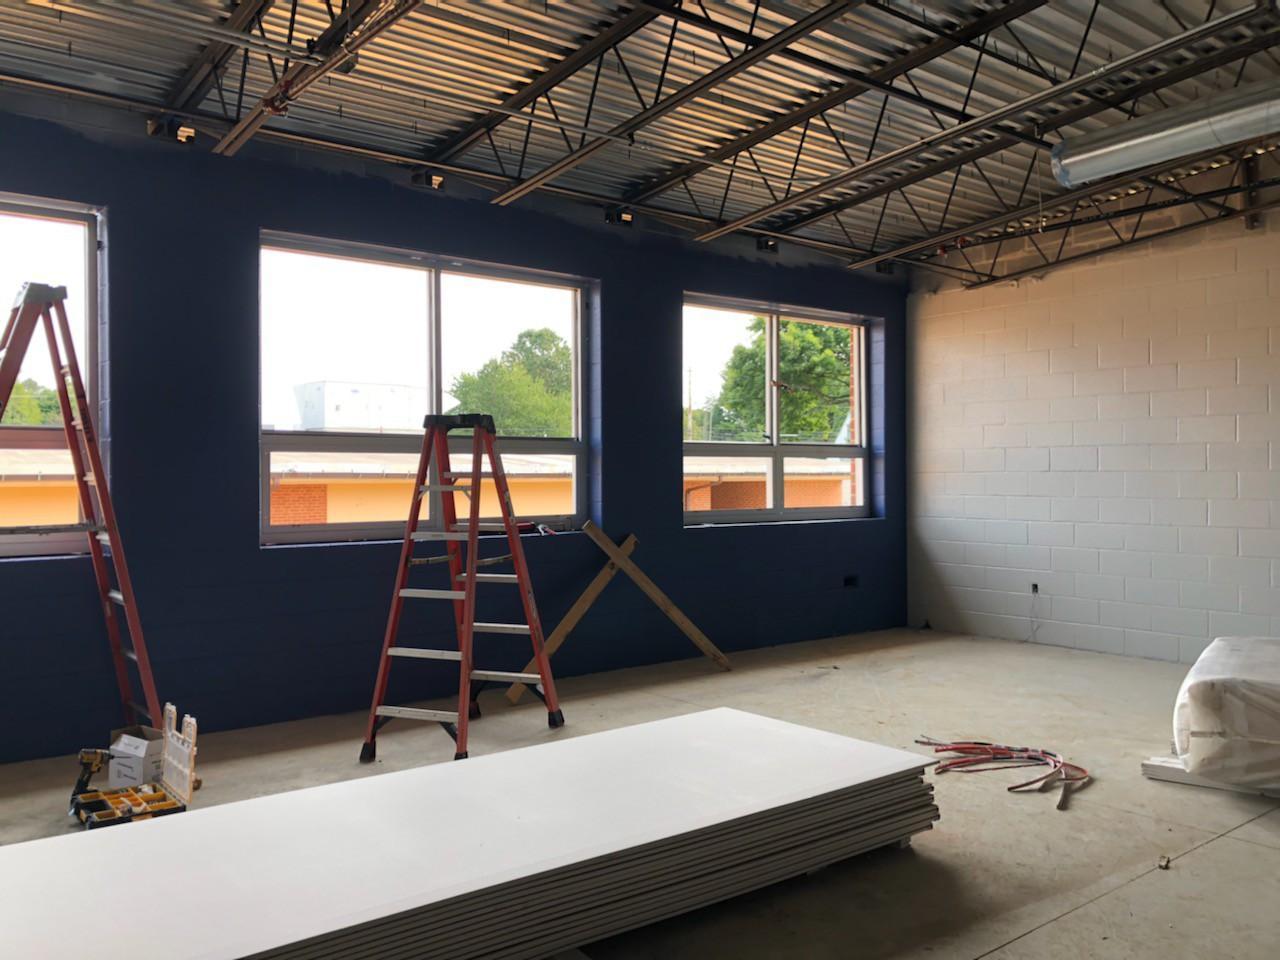 9-18-20 new classroom